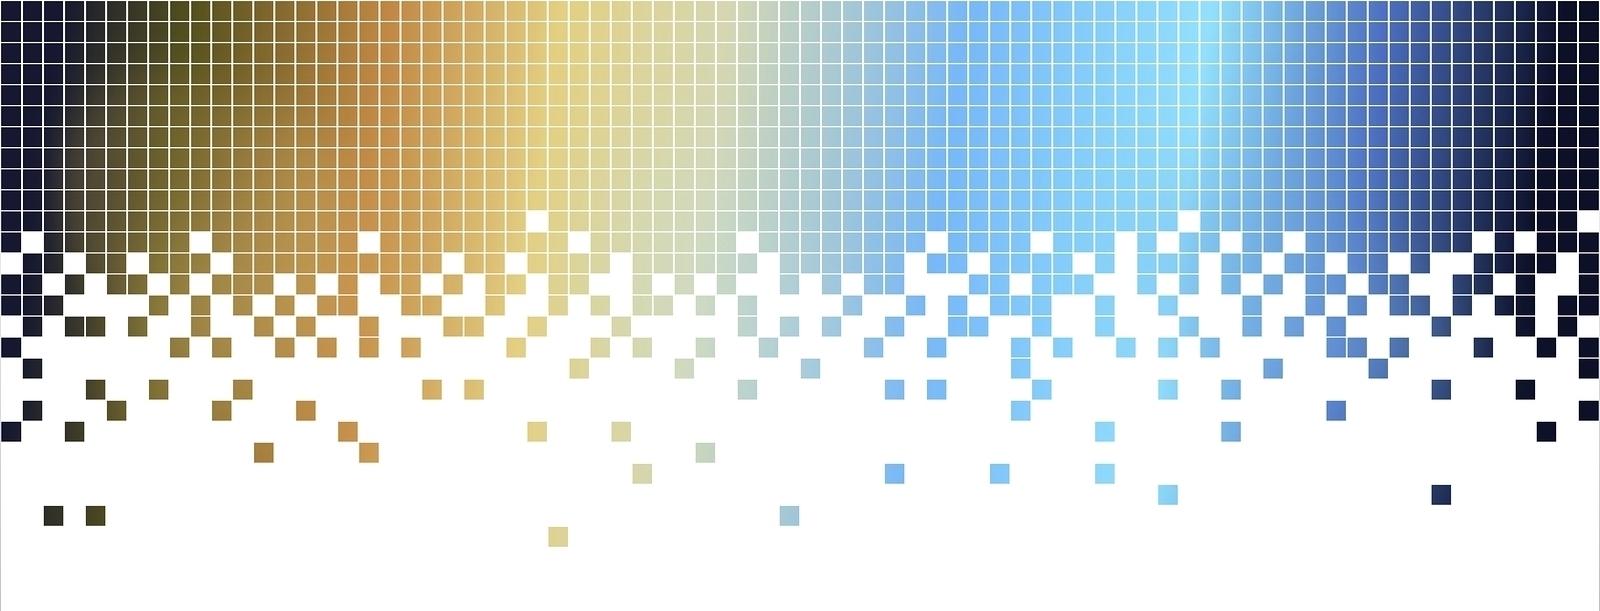 bigstock-Abstract-Colurful-Mosaic-Backg-93874250.jpg